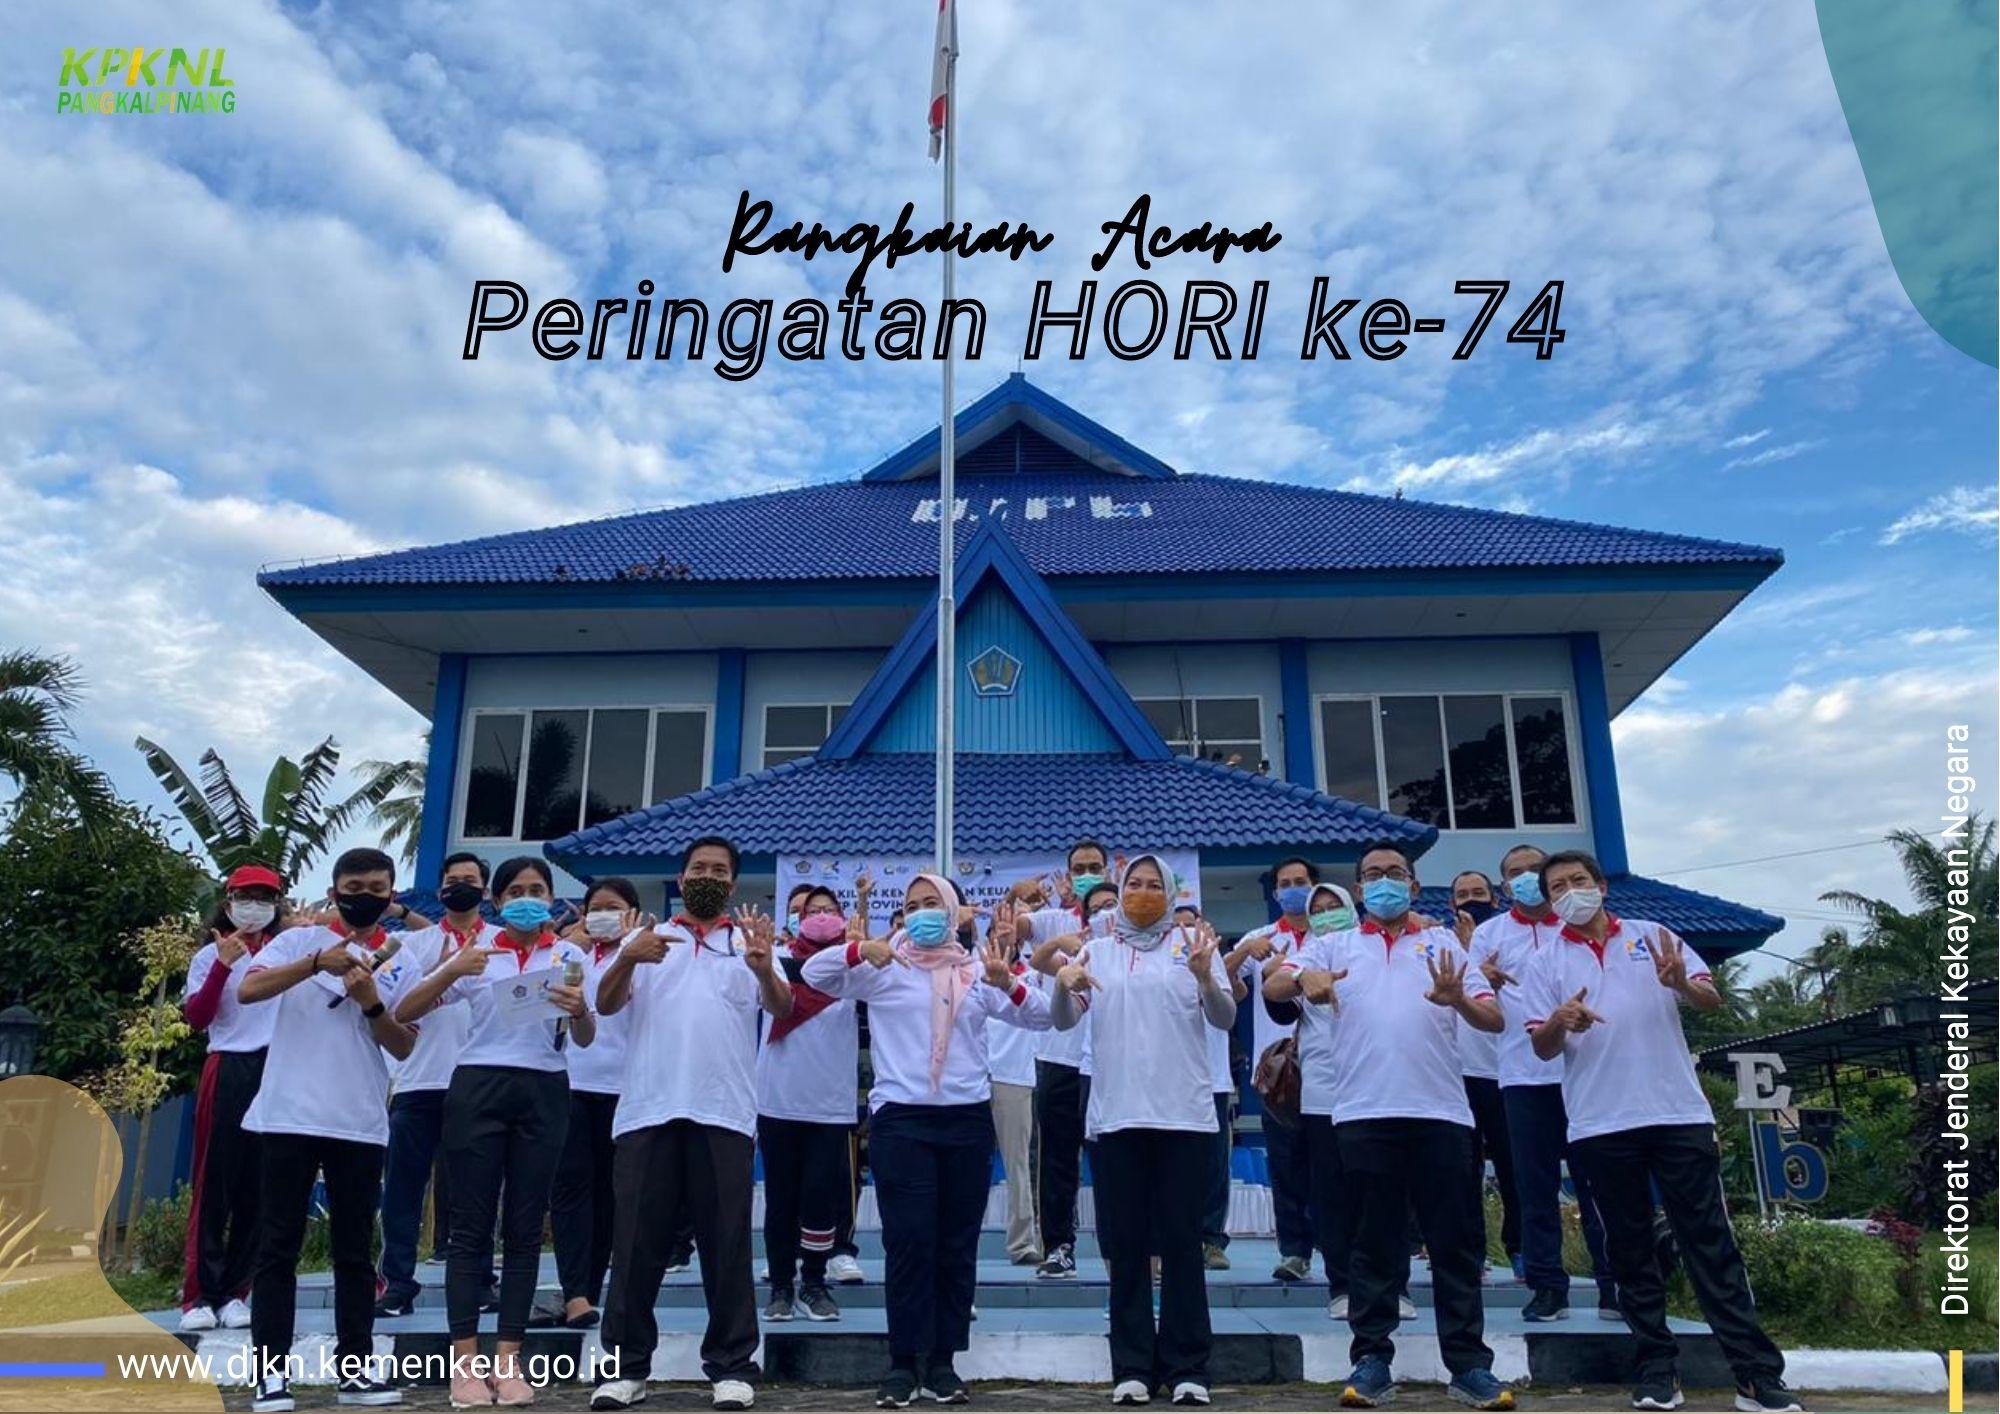 Tetap Mematuhi Protokol Kesehatan, Perwakilan Kemenkeu Kepulauan Bangka Belitung Meriahkan HORI ke-74